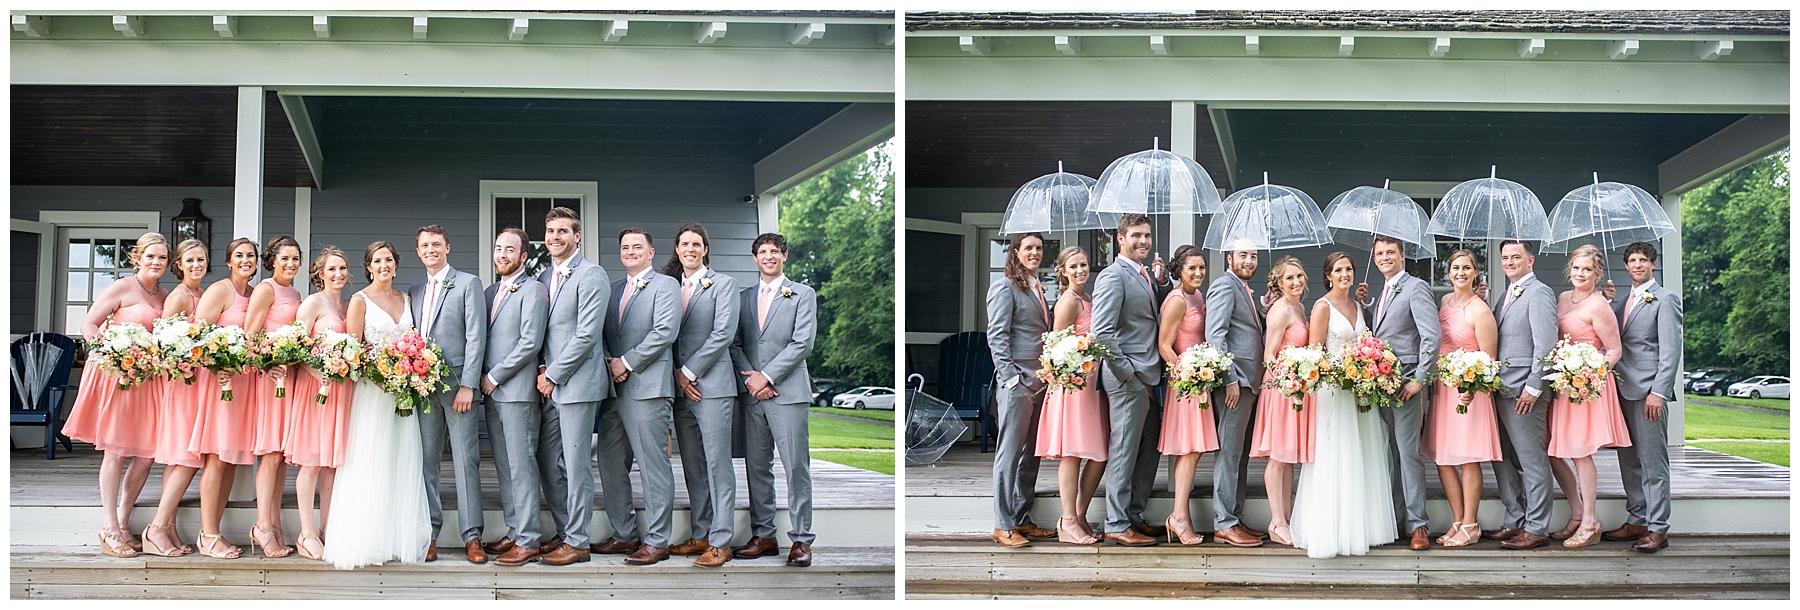 Chelsea Phil Bohemia River Overlook Wedding Living Radiant Photography photos_0077.jpg